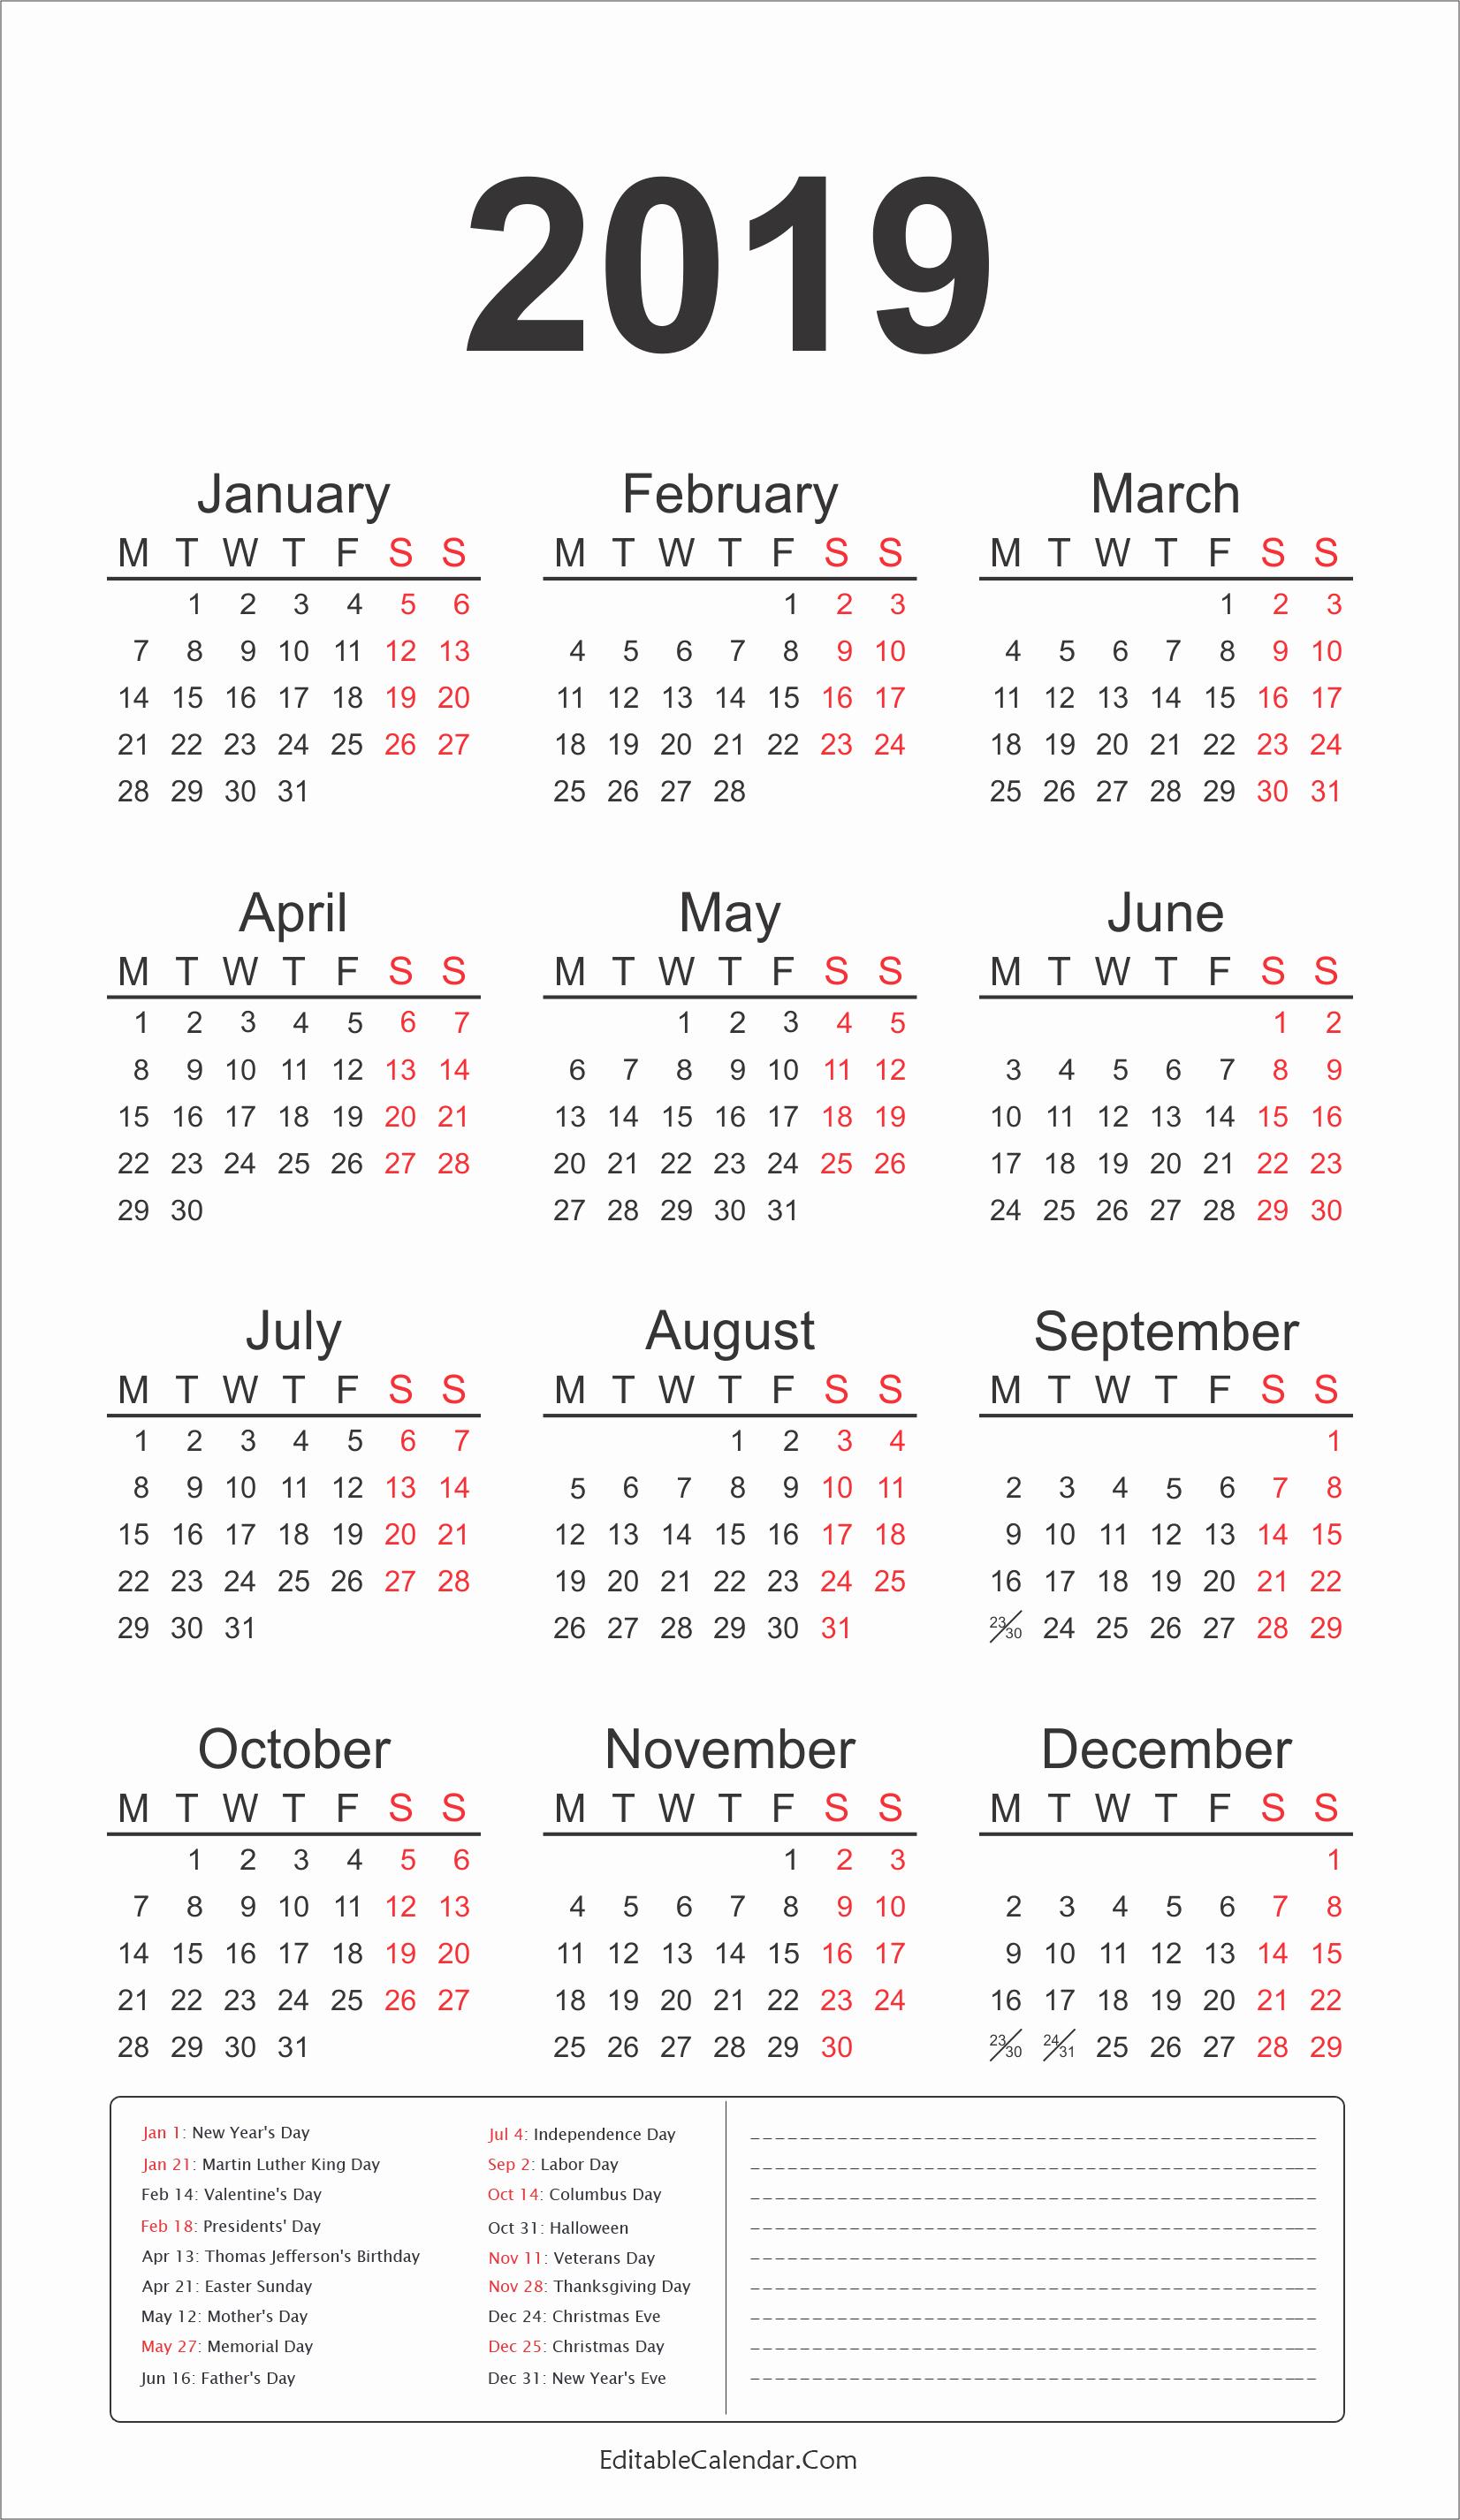 Federal Holidays Printable Calendars 2019 2019 Calendar Template Calendar 2019 Federal Holidays